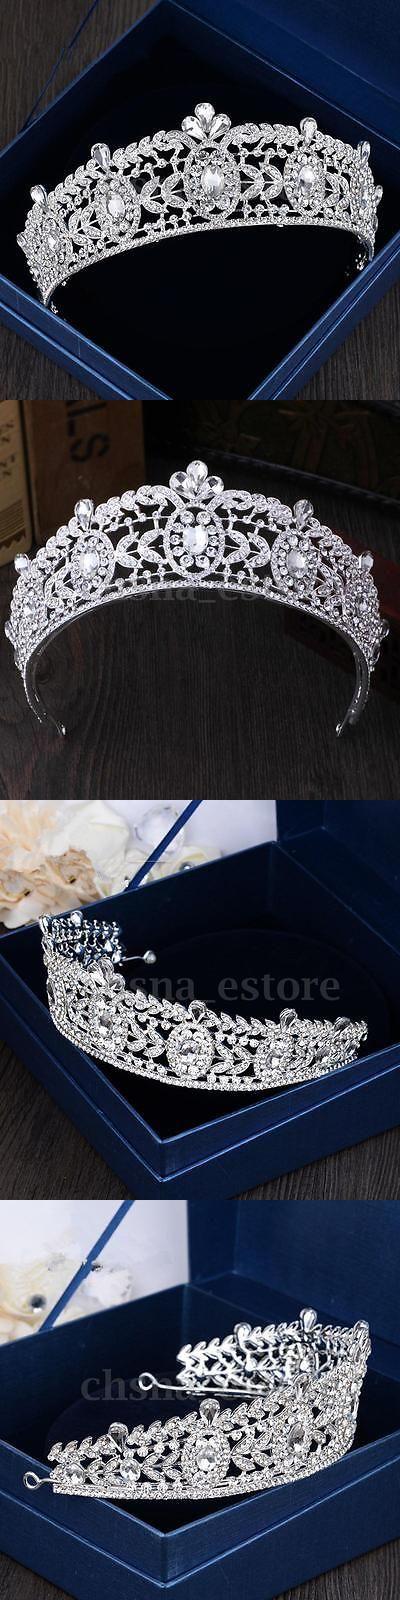 Bridal Accessories: Silver Wedding Bridal Crystal Rhinestone Headband Queen Crown Tiara Prom Jewelry -> BUY IT NOW ONLY: $30.99 on eBay!